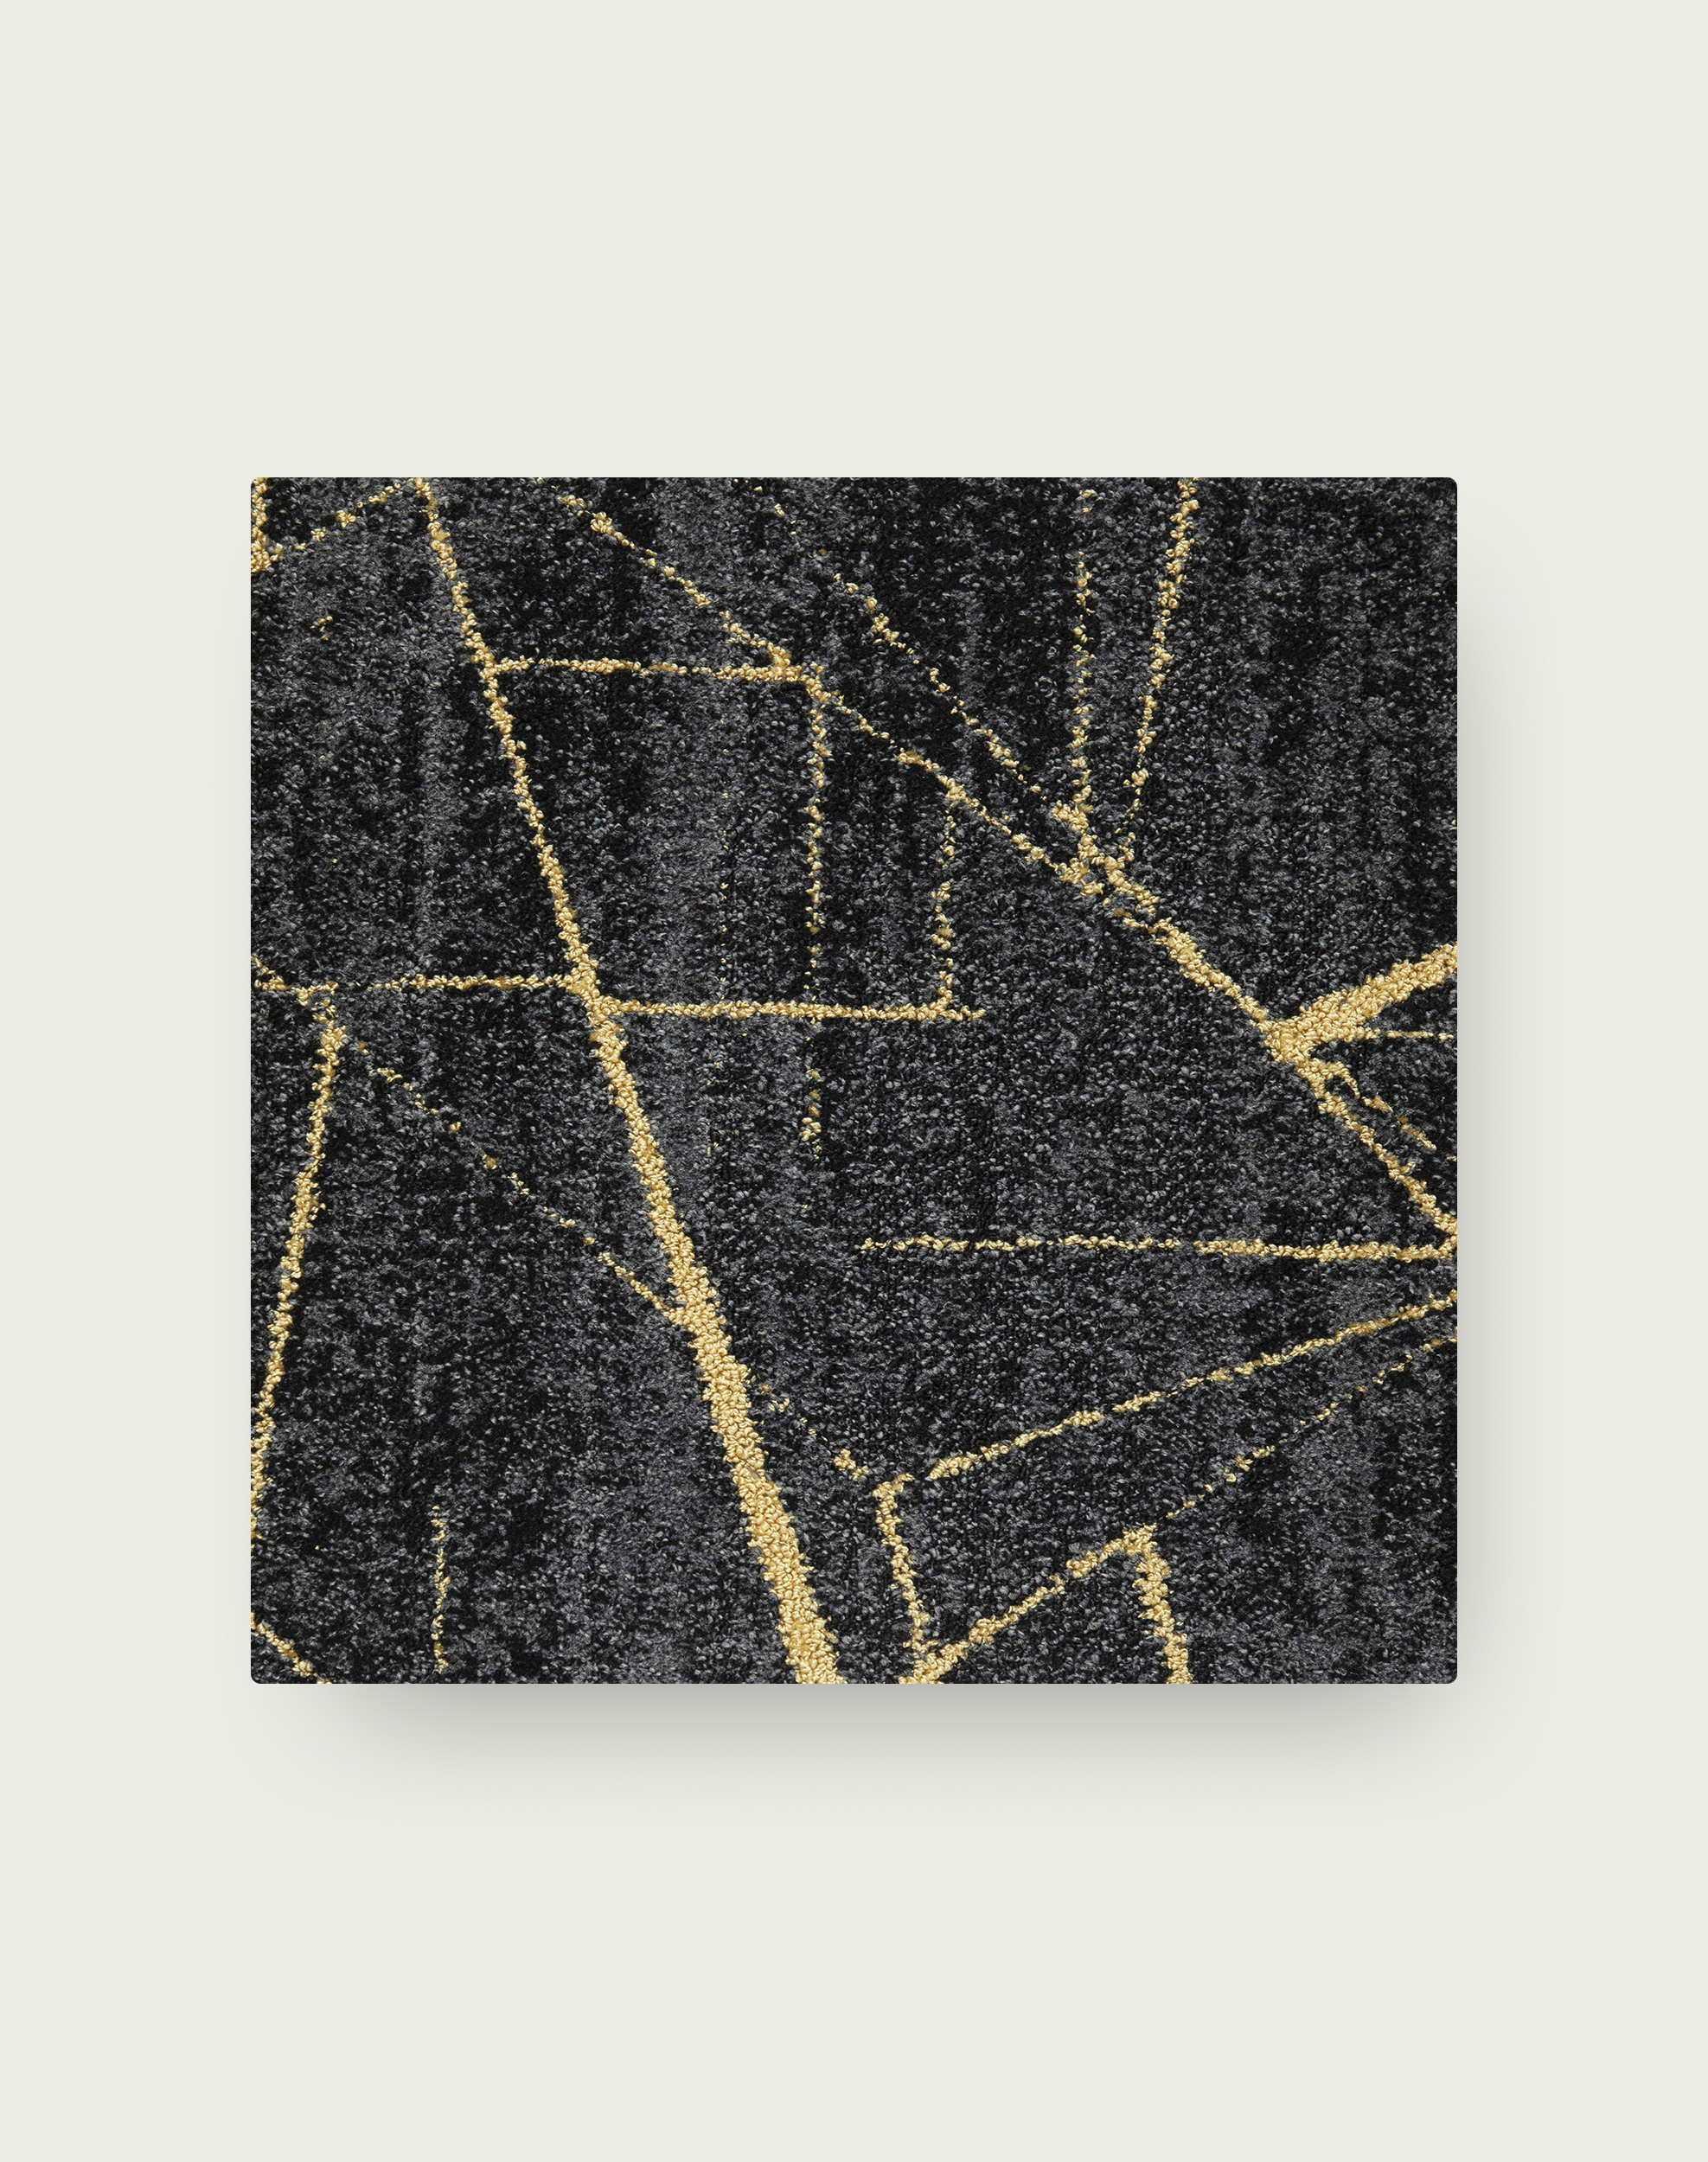 Chasing Pavement - Flint / Gold